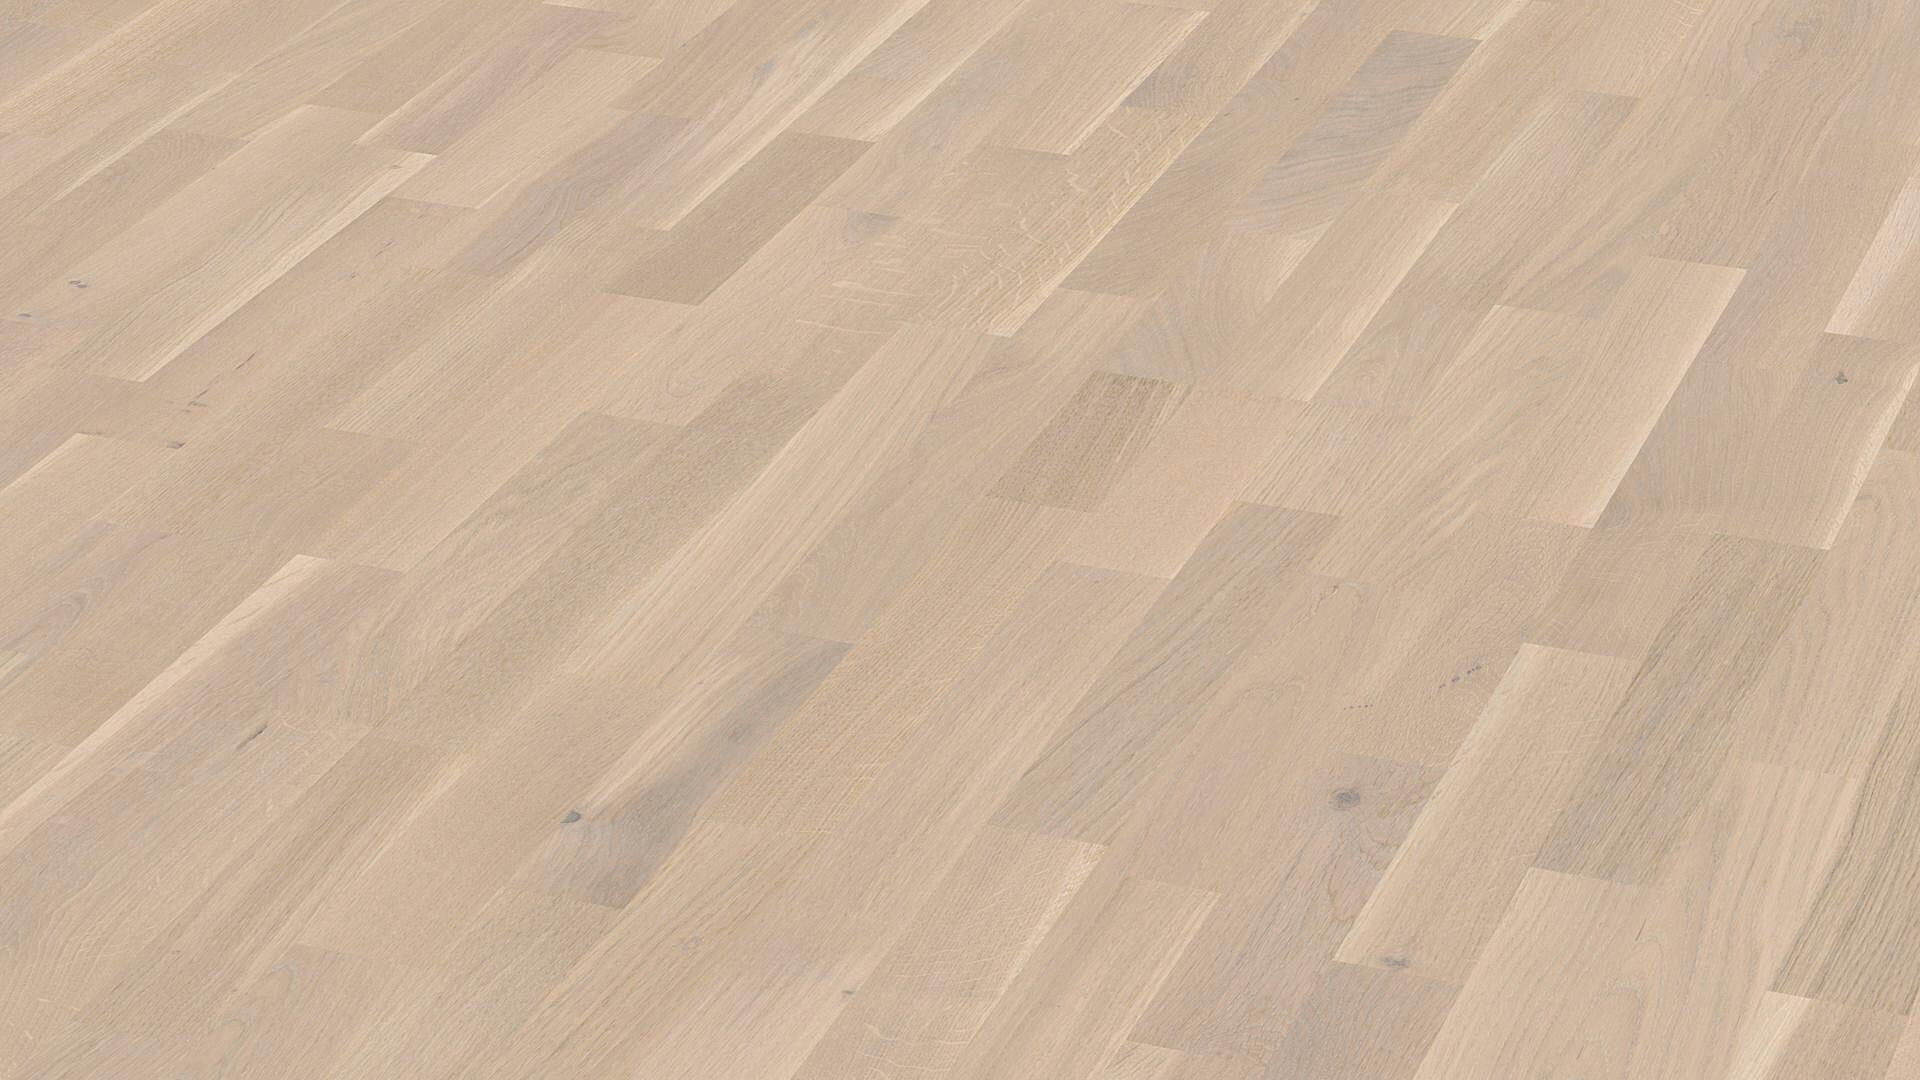 Parquet flooring MeisterParquet. longlife PC 200 Off-white oak lively 8460